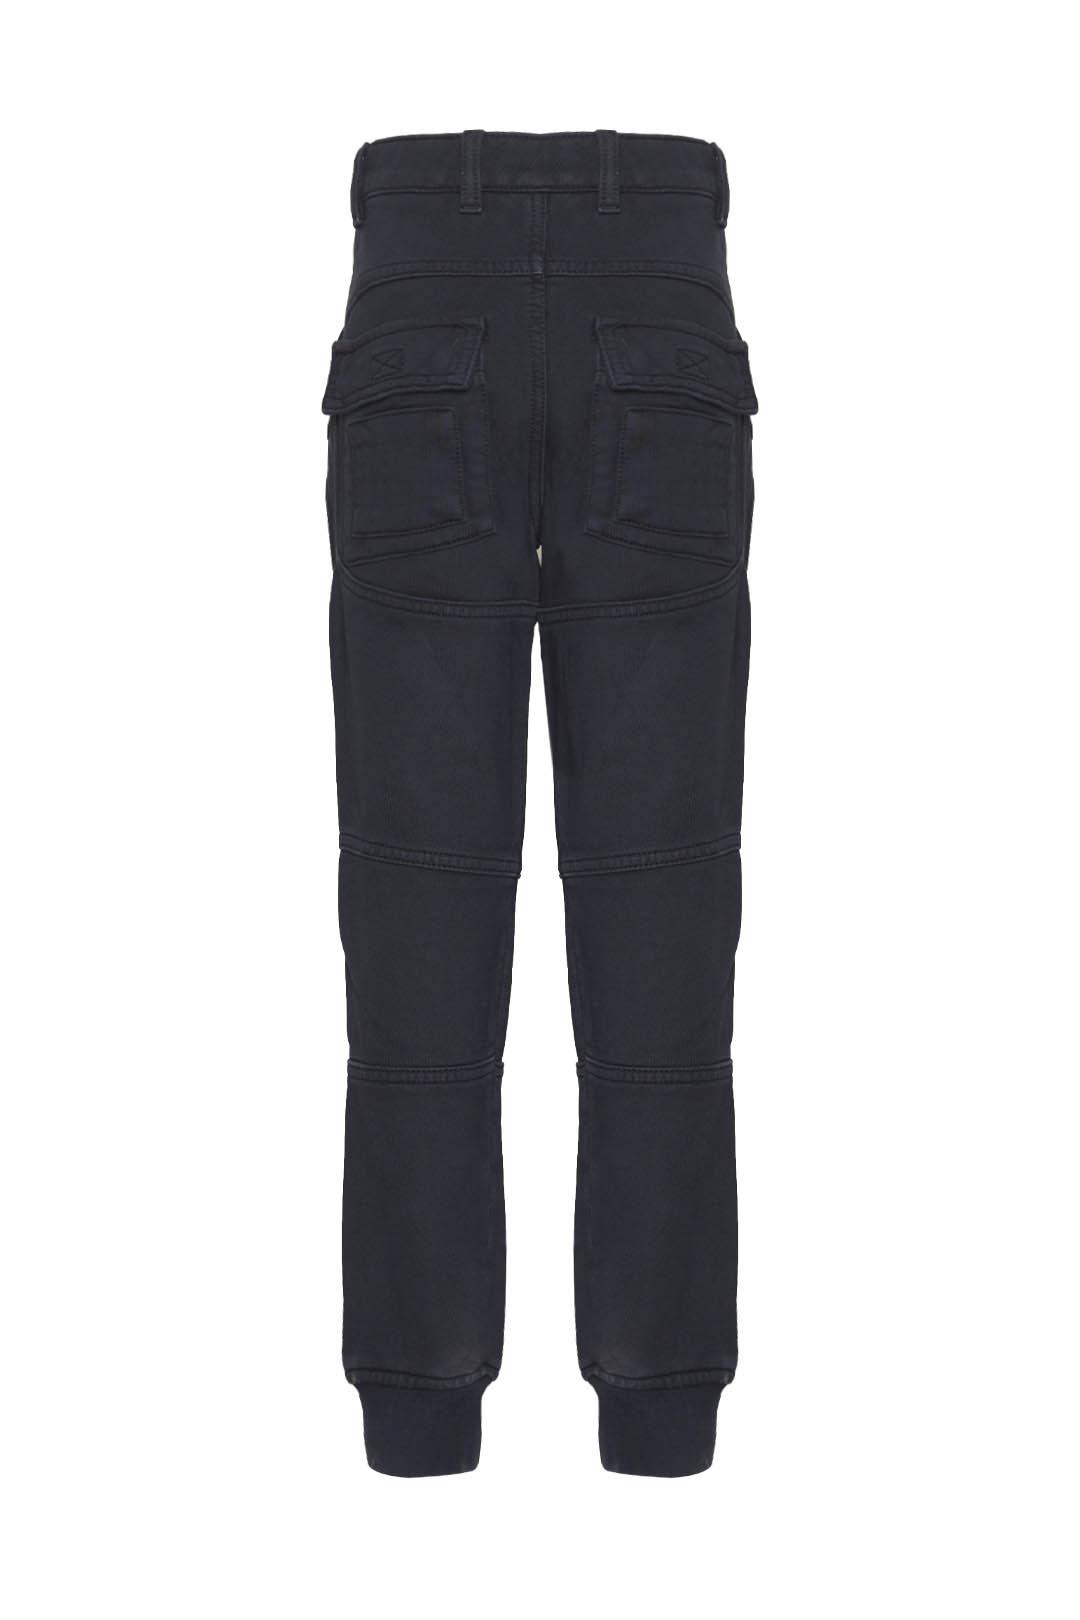 Pantalone Anti-G in felpa di cotone      2